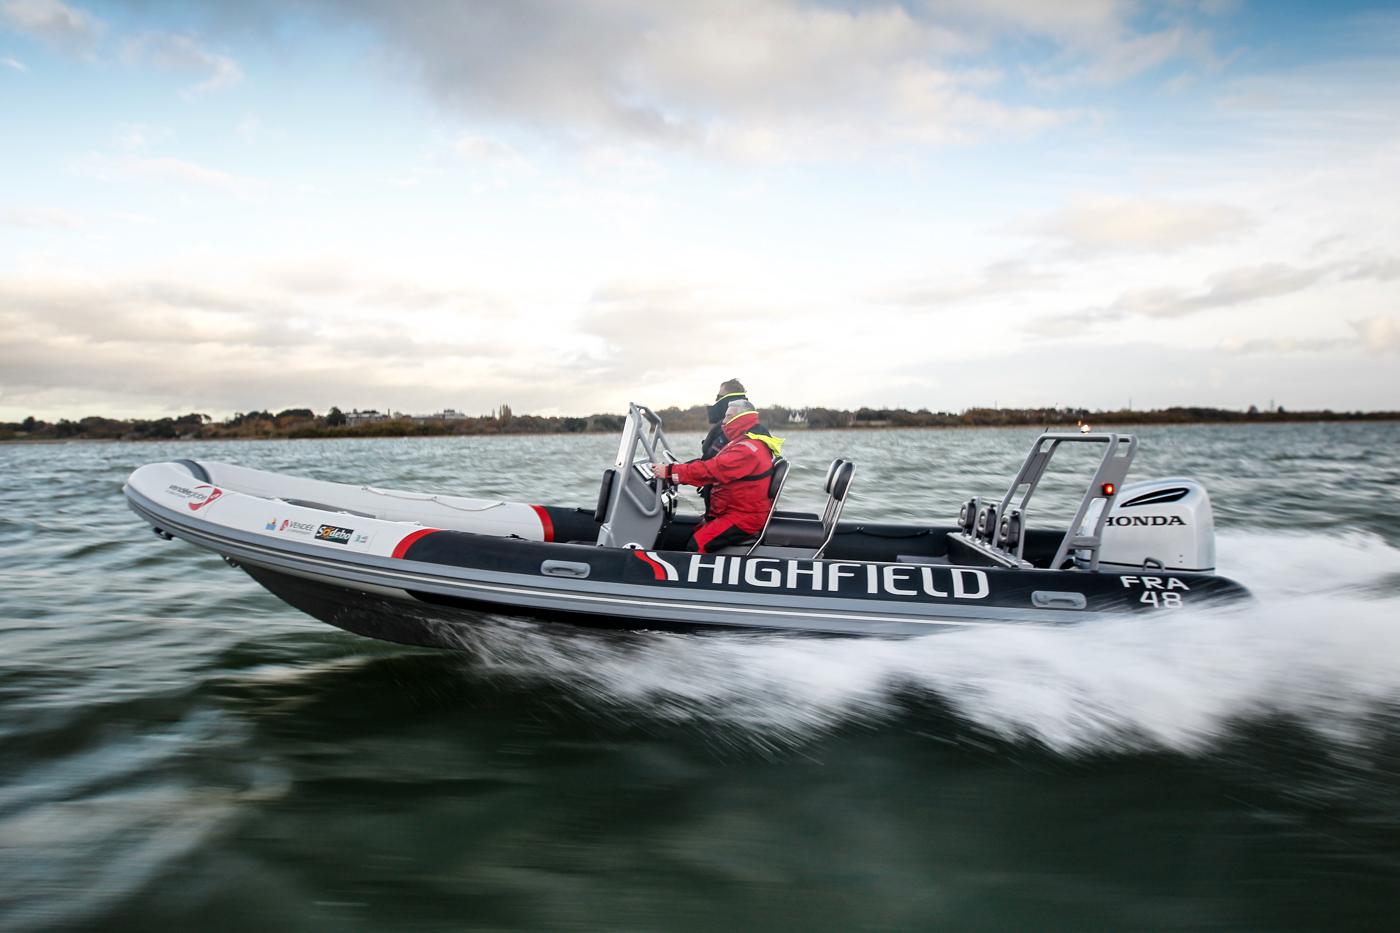 Highfiel Patrol 760